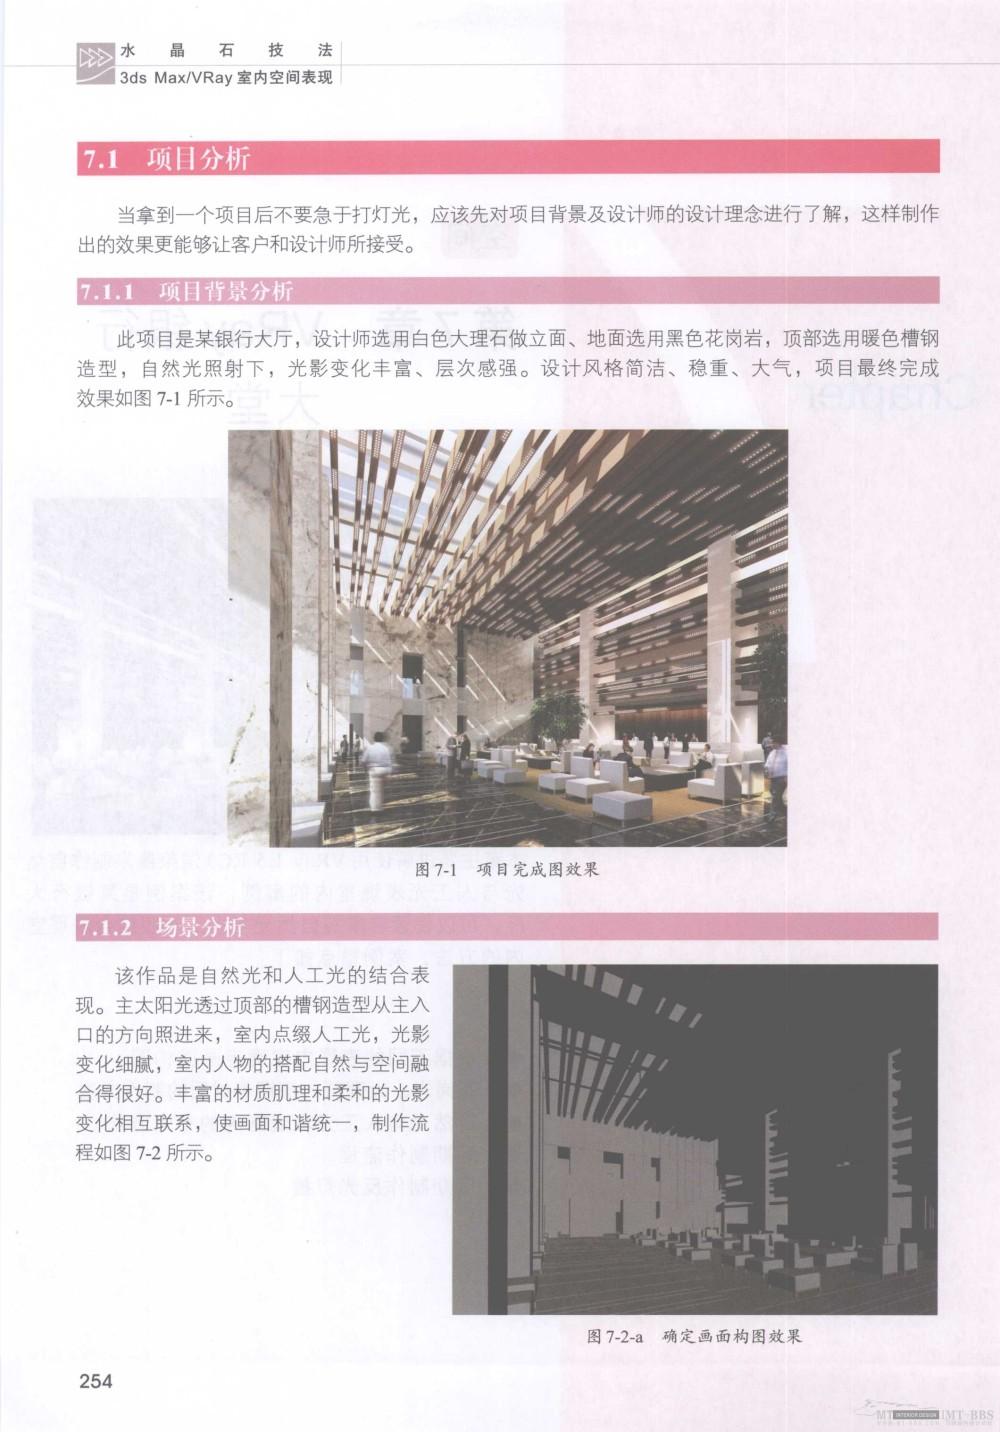 水晶石技法-3ds_Max&VRay室内空间表现_水晶石技法-3ds_Max&VRay室内空间表现_页面_260.jpg